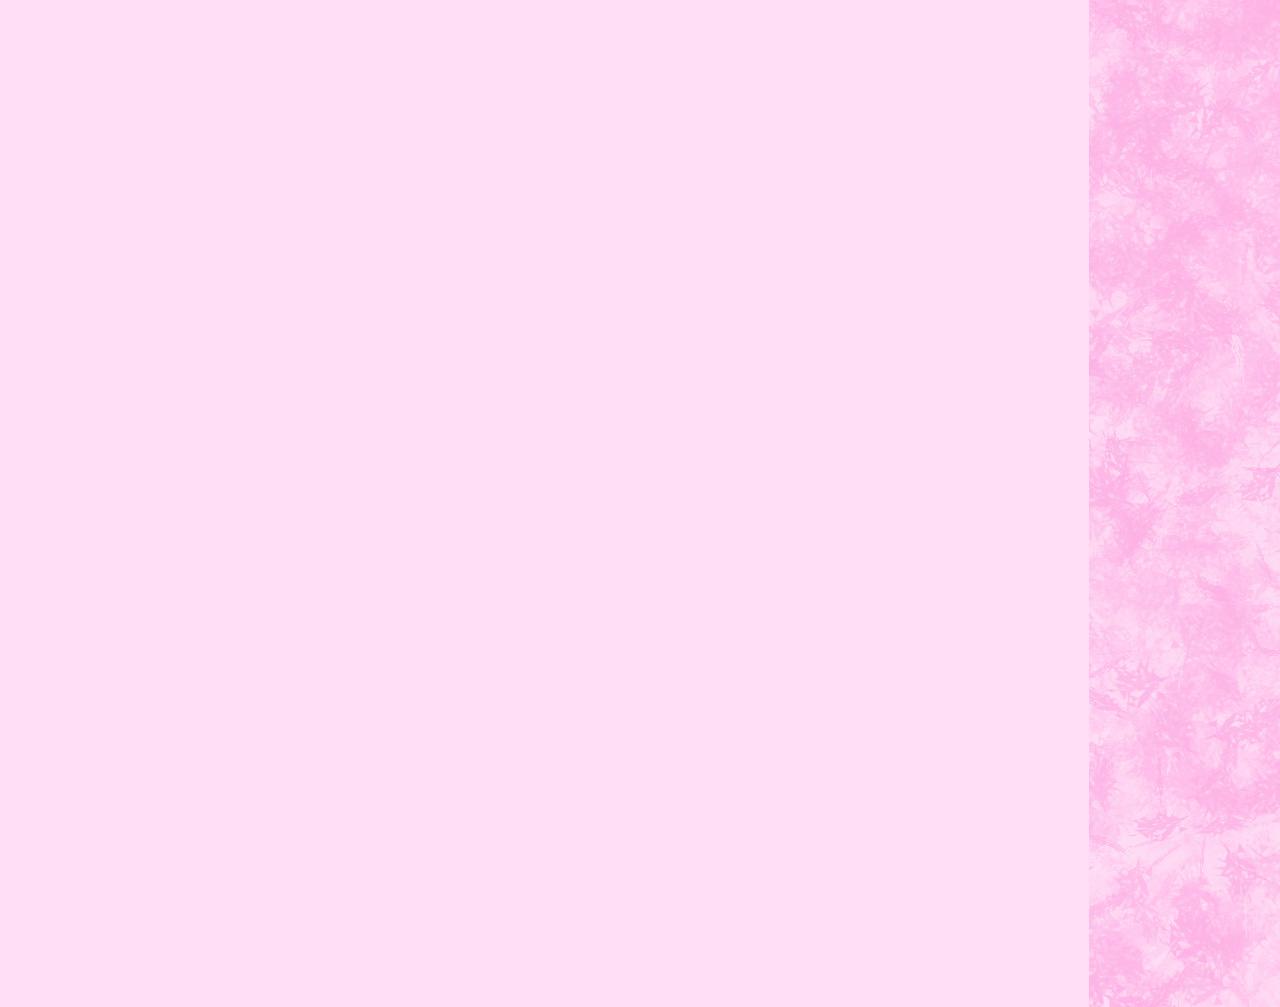 Baby Background Images - WallpaperSafari Pink Baby Background Wallpaper